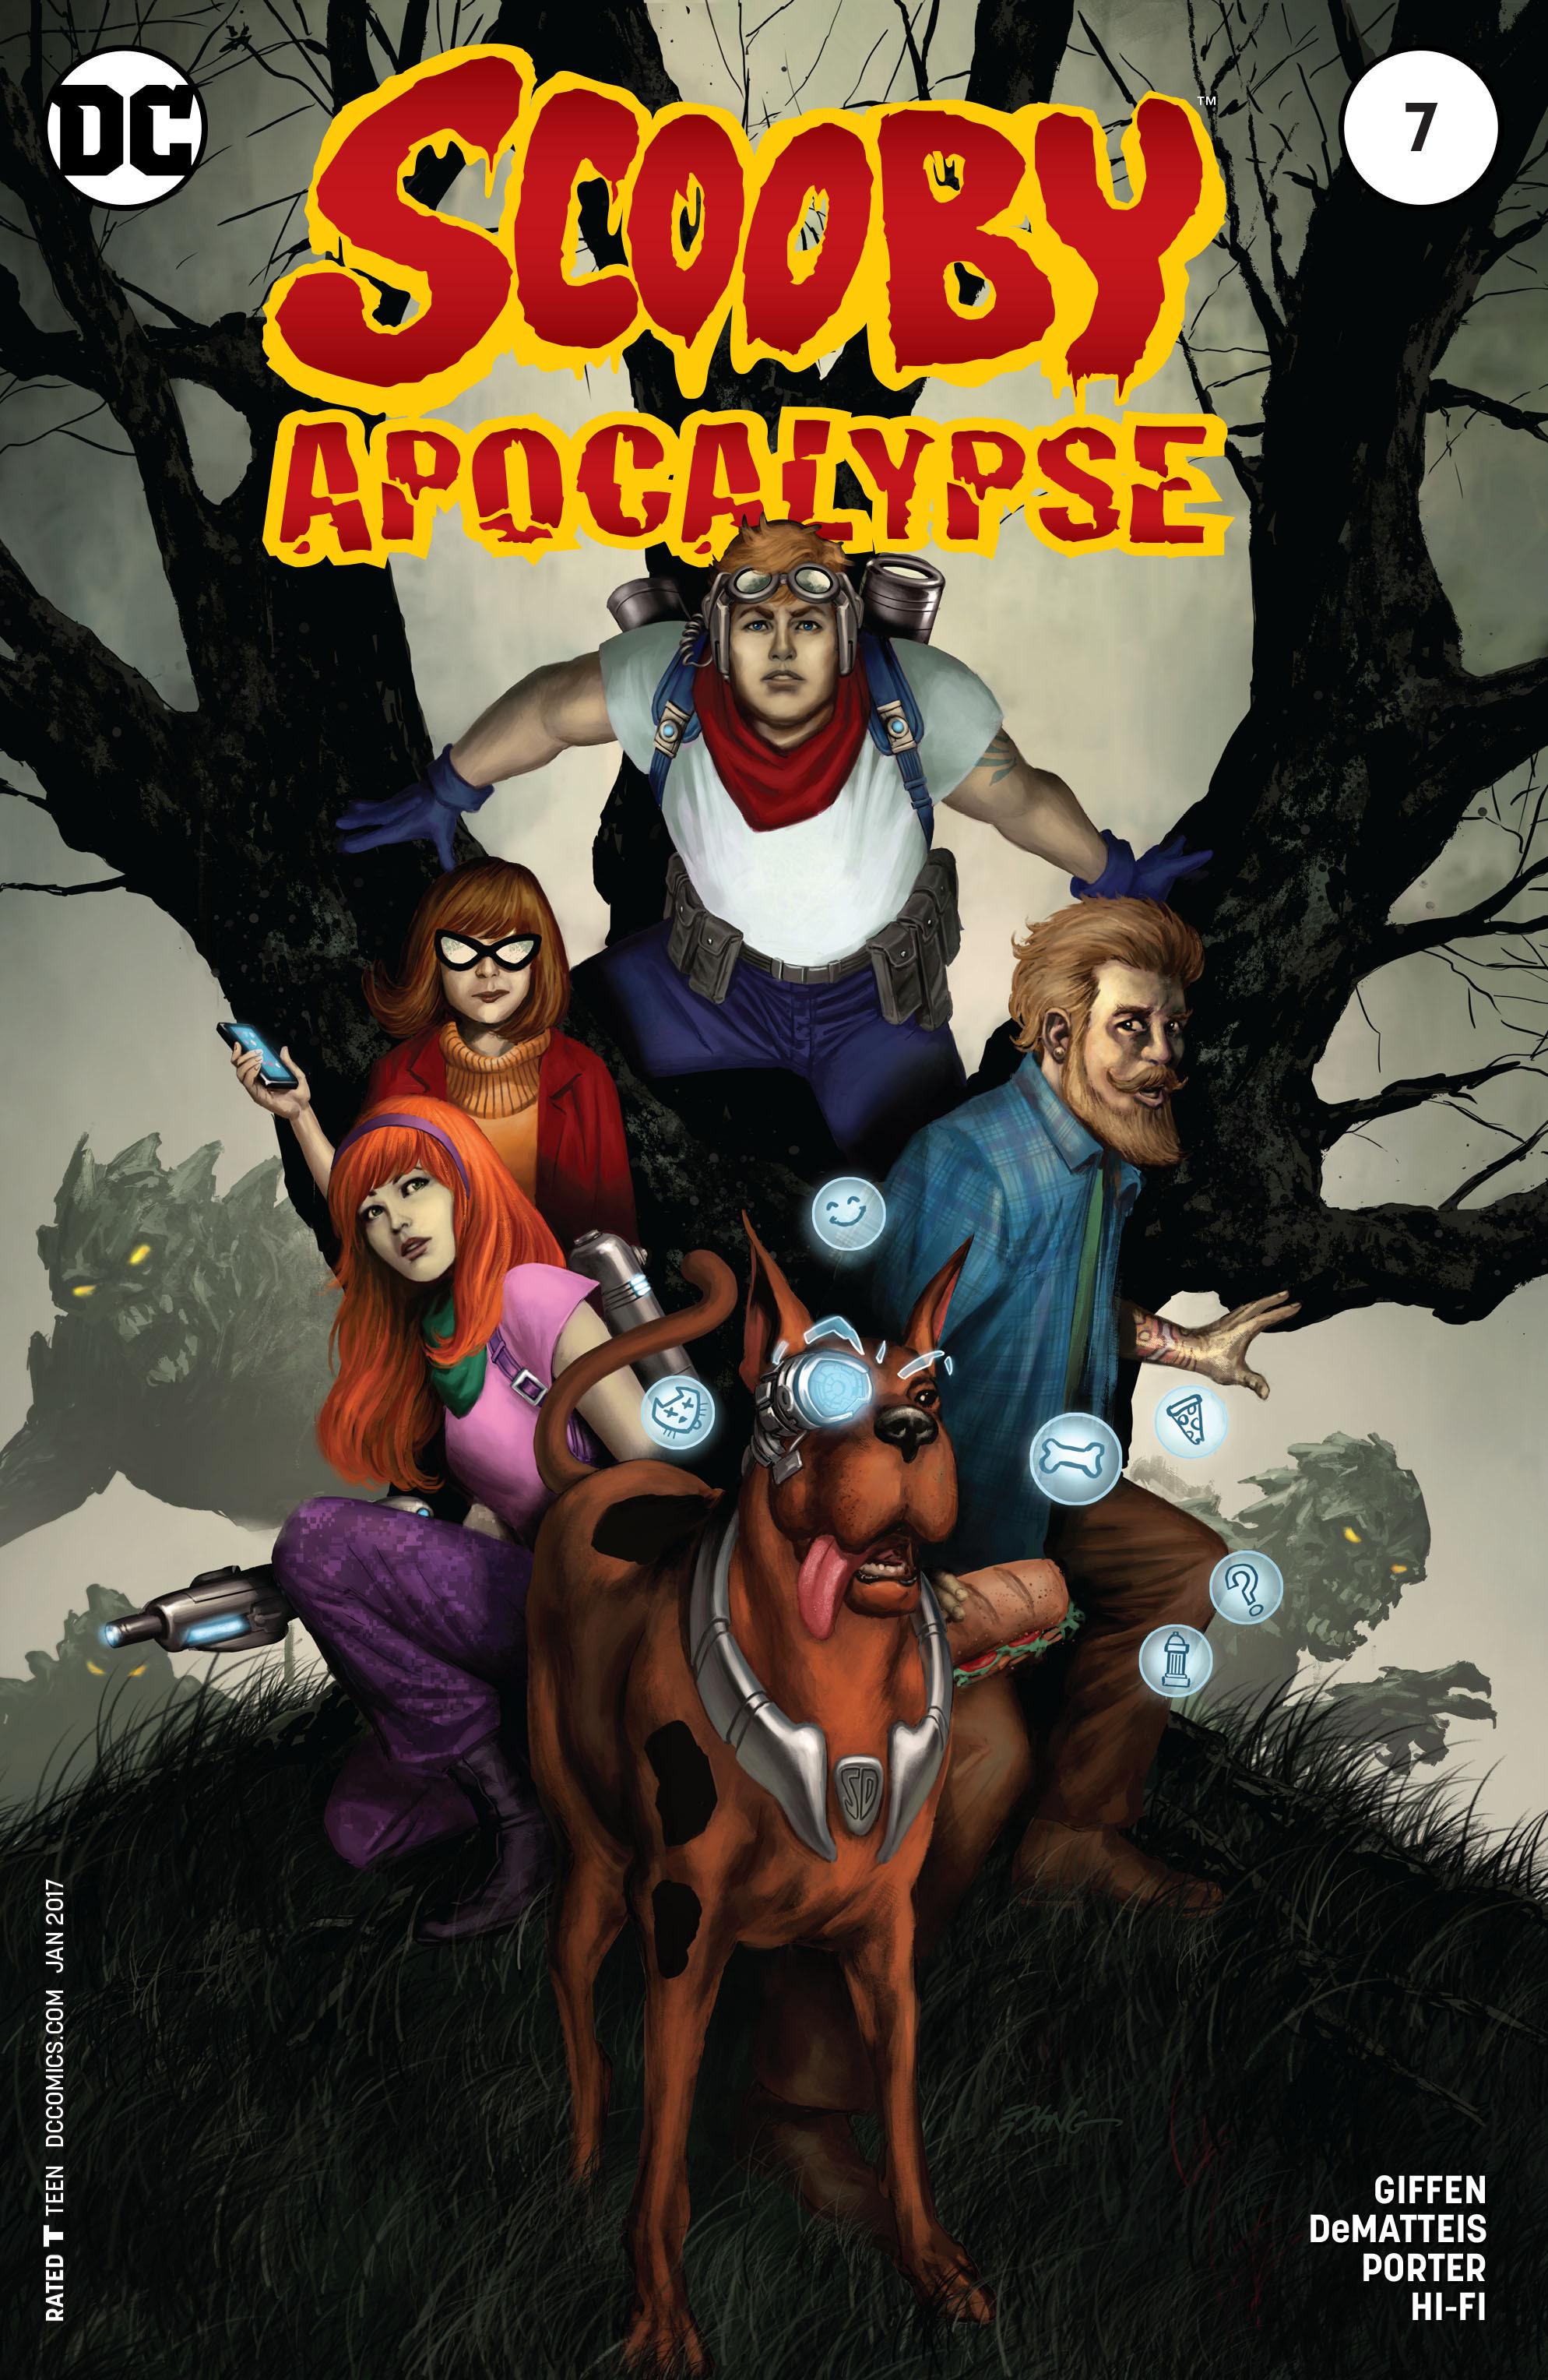 Read online Scooby Apocalypse comic -  Issue #7 - 3